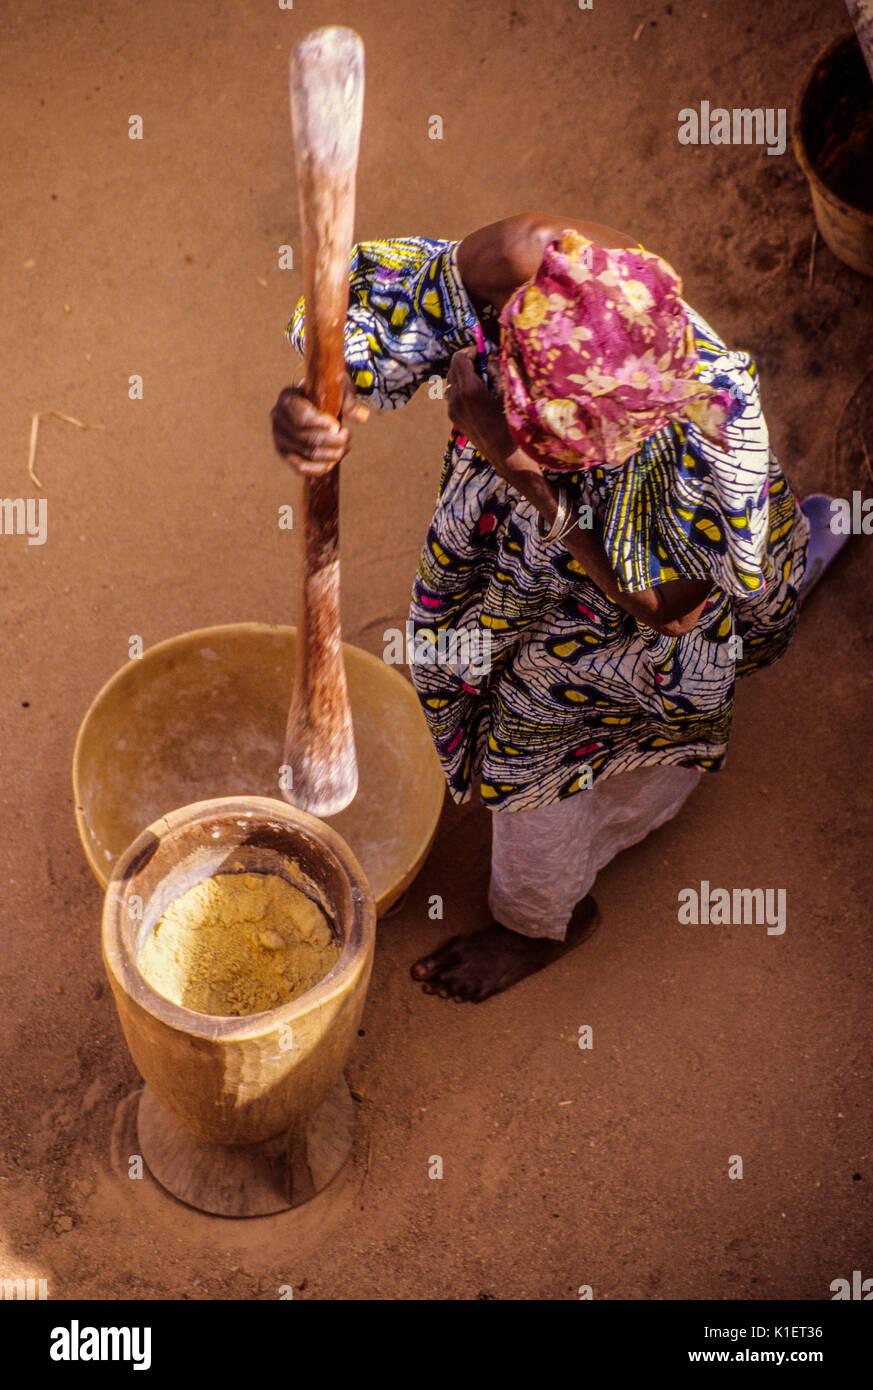 Niger, Agadez, West Africa.  Woman Pounding Millet to make Flour. - Stock Image